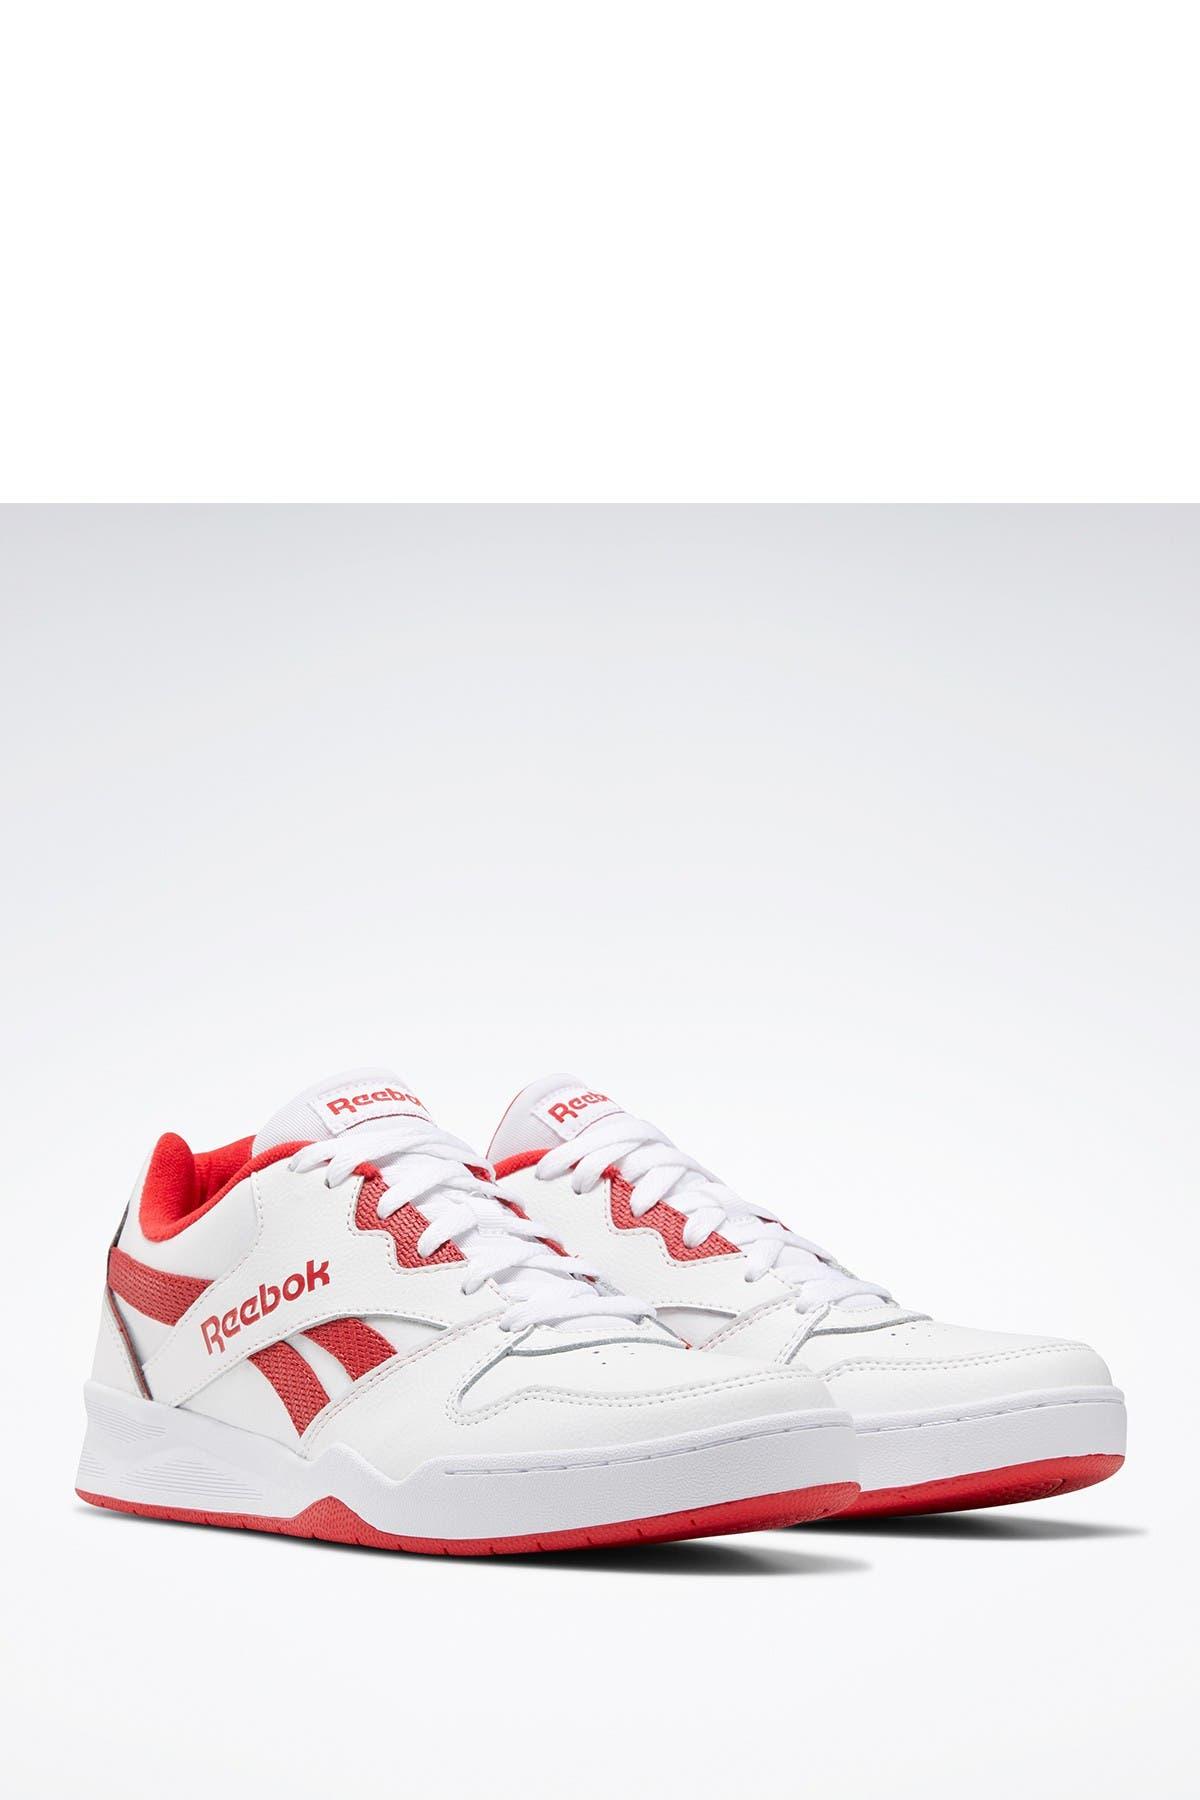 Image of Reebok Royal Bb4500 Low 2 Sneaker